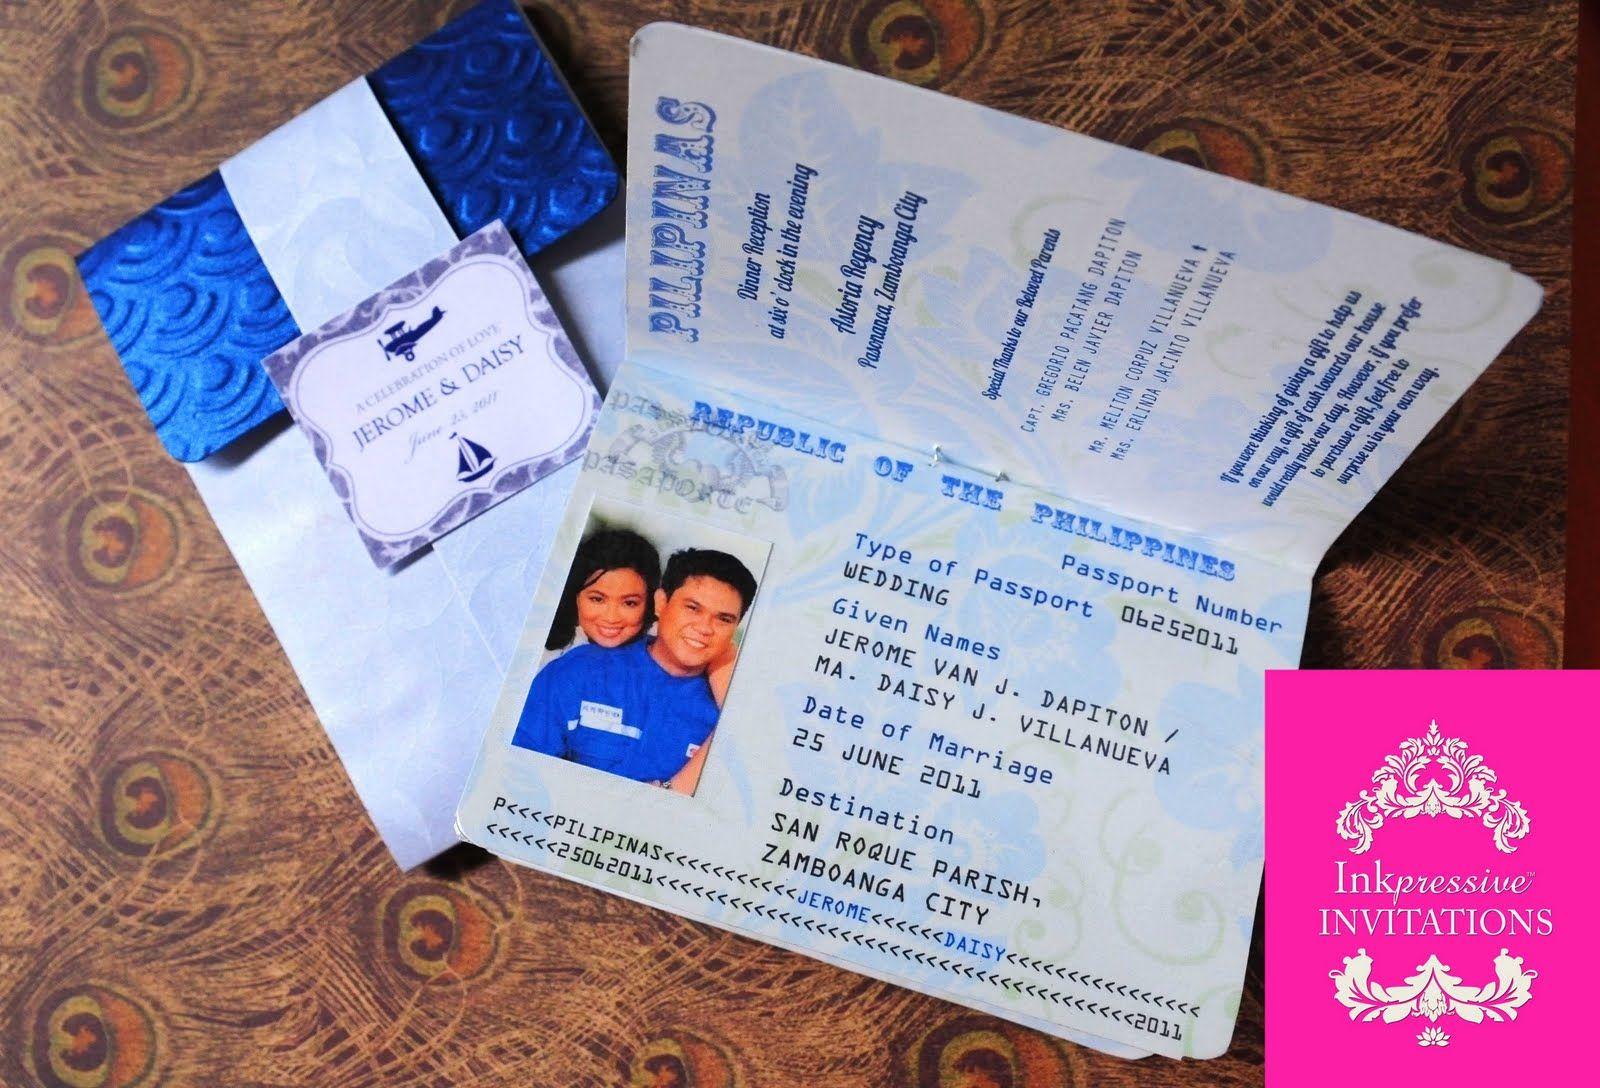 passport wedding invitations template - The Originality of the